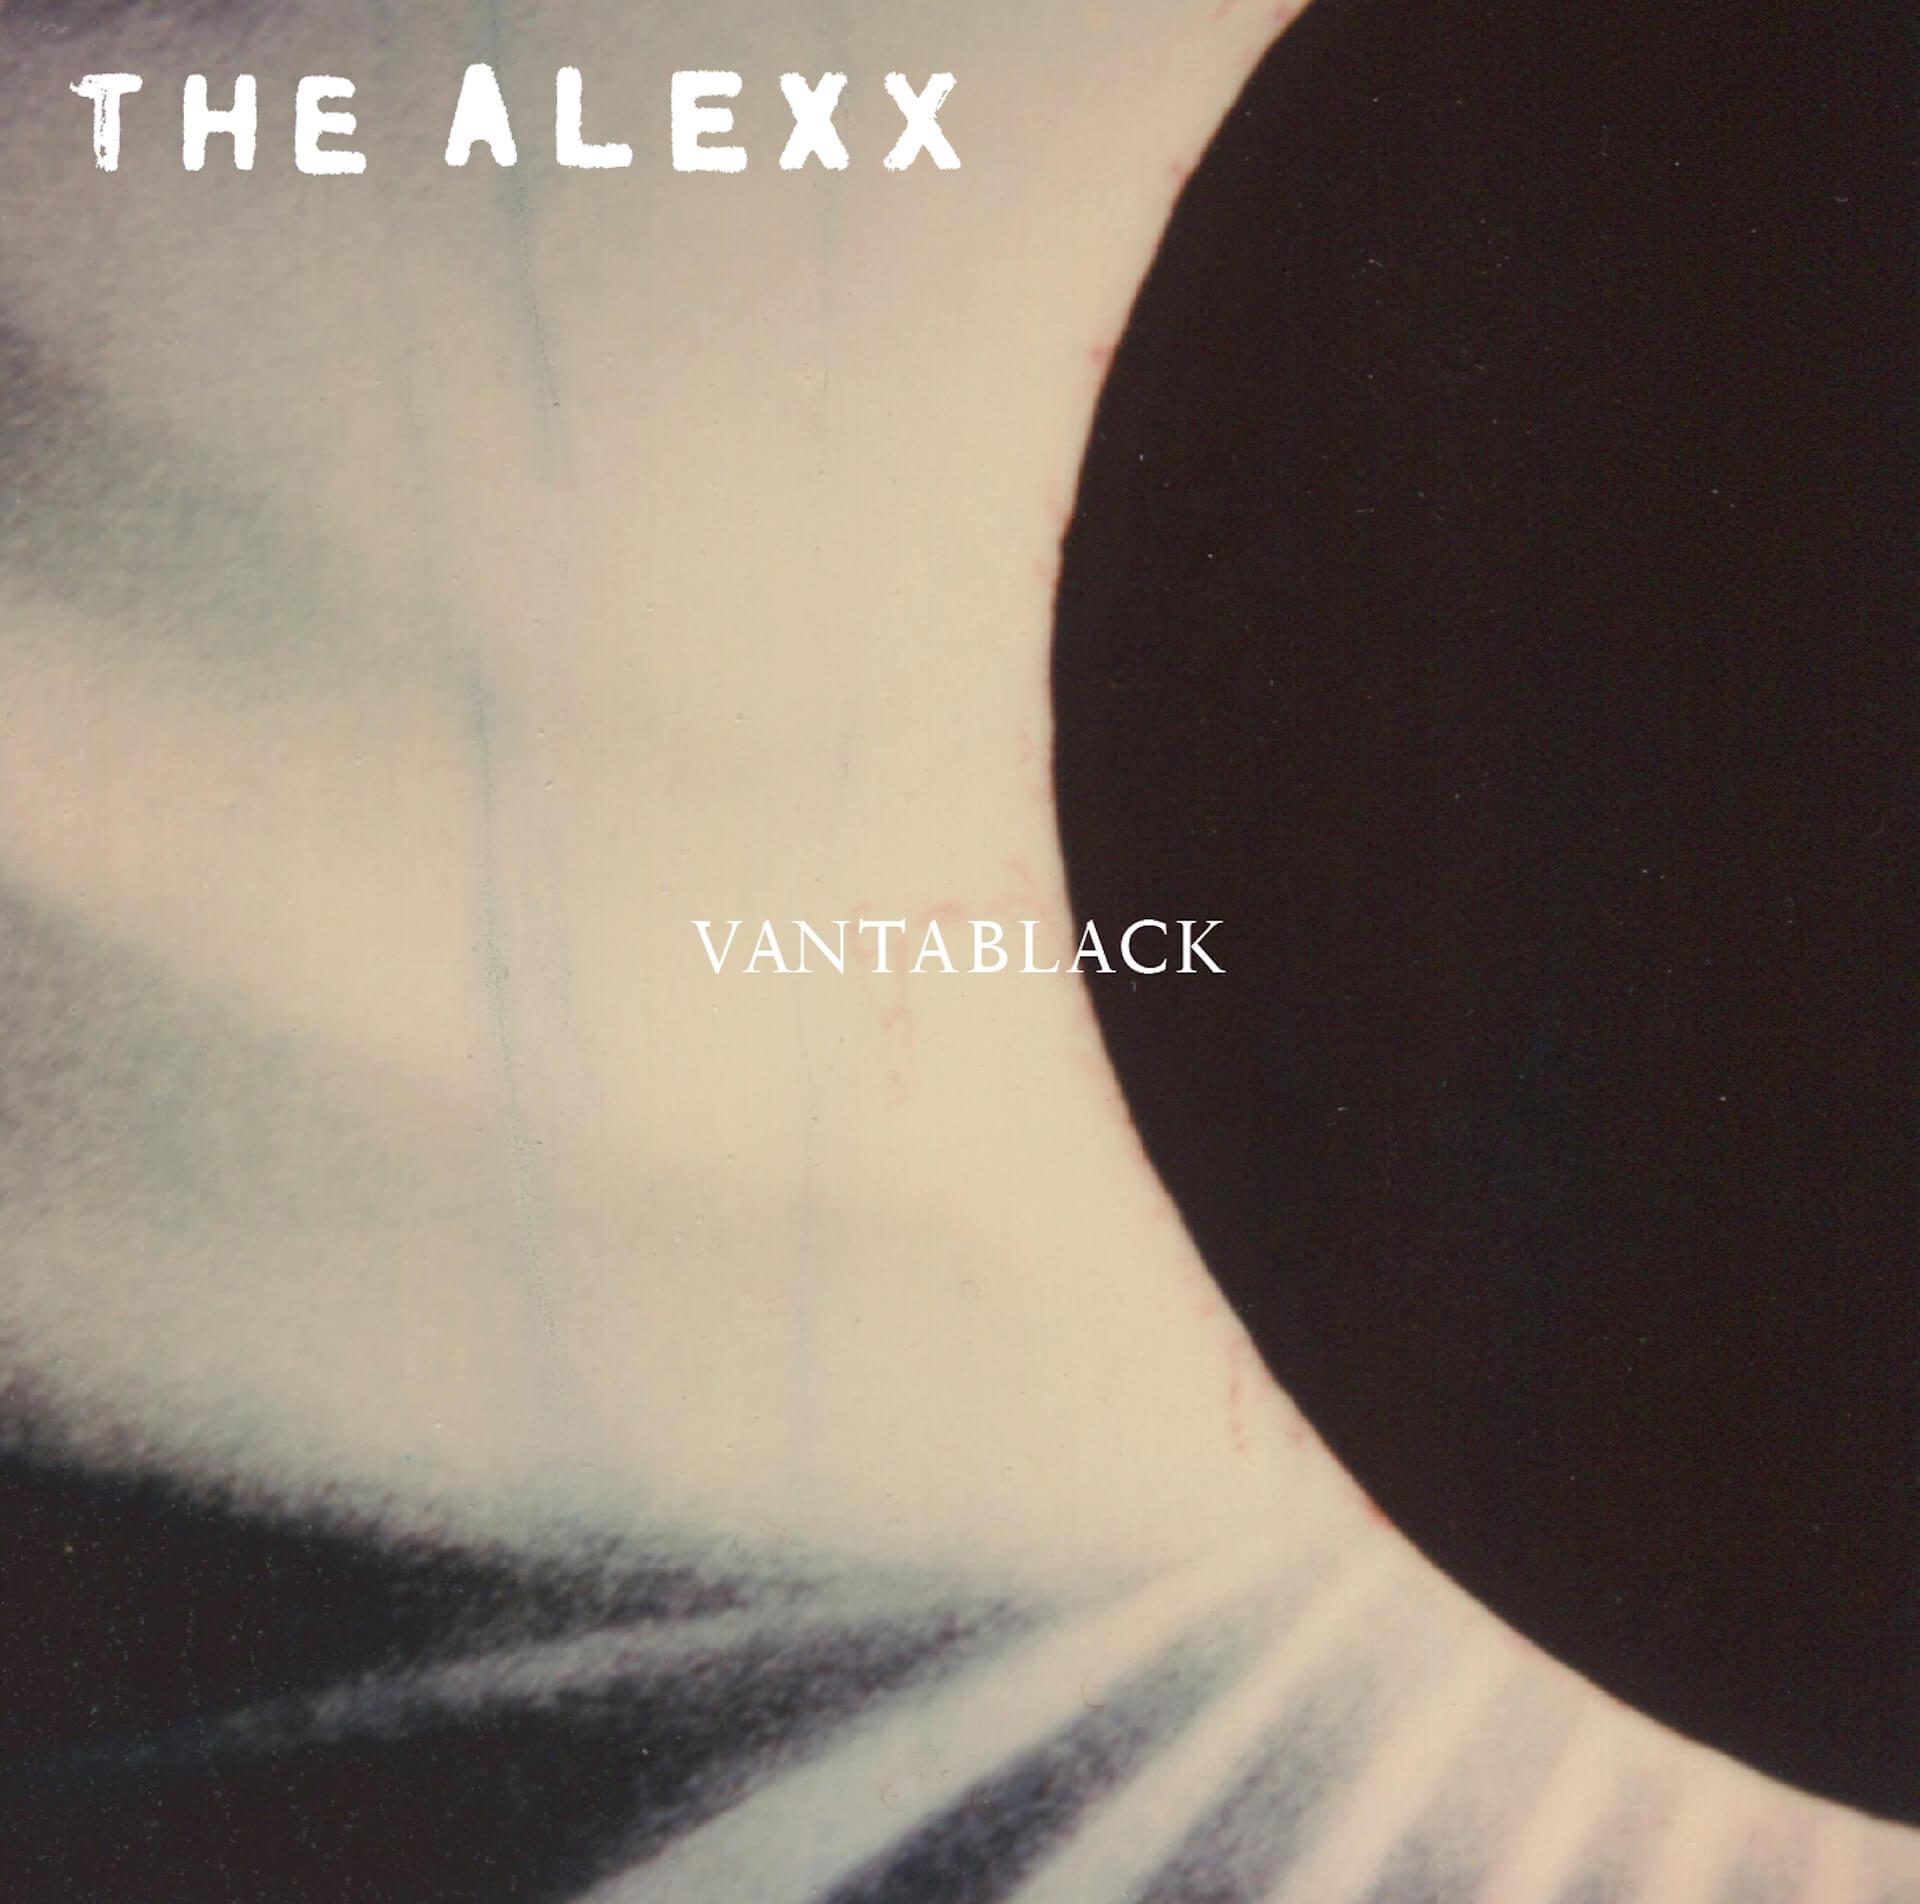 THE ALEXXが示す新しい陶酔の形|柴那典ライブレポート<SHIBUYA CLUB QUATTRO GAN-BAN NIGHT SPECIAL> music191220_thealexx_12